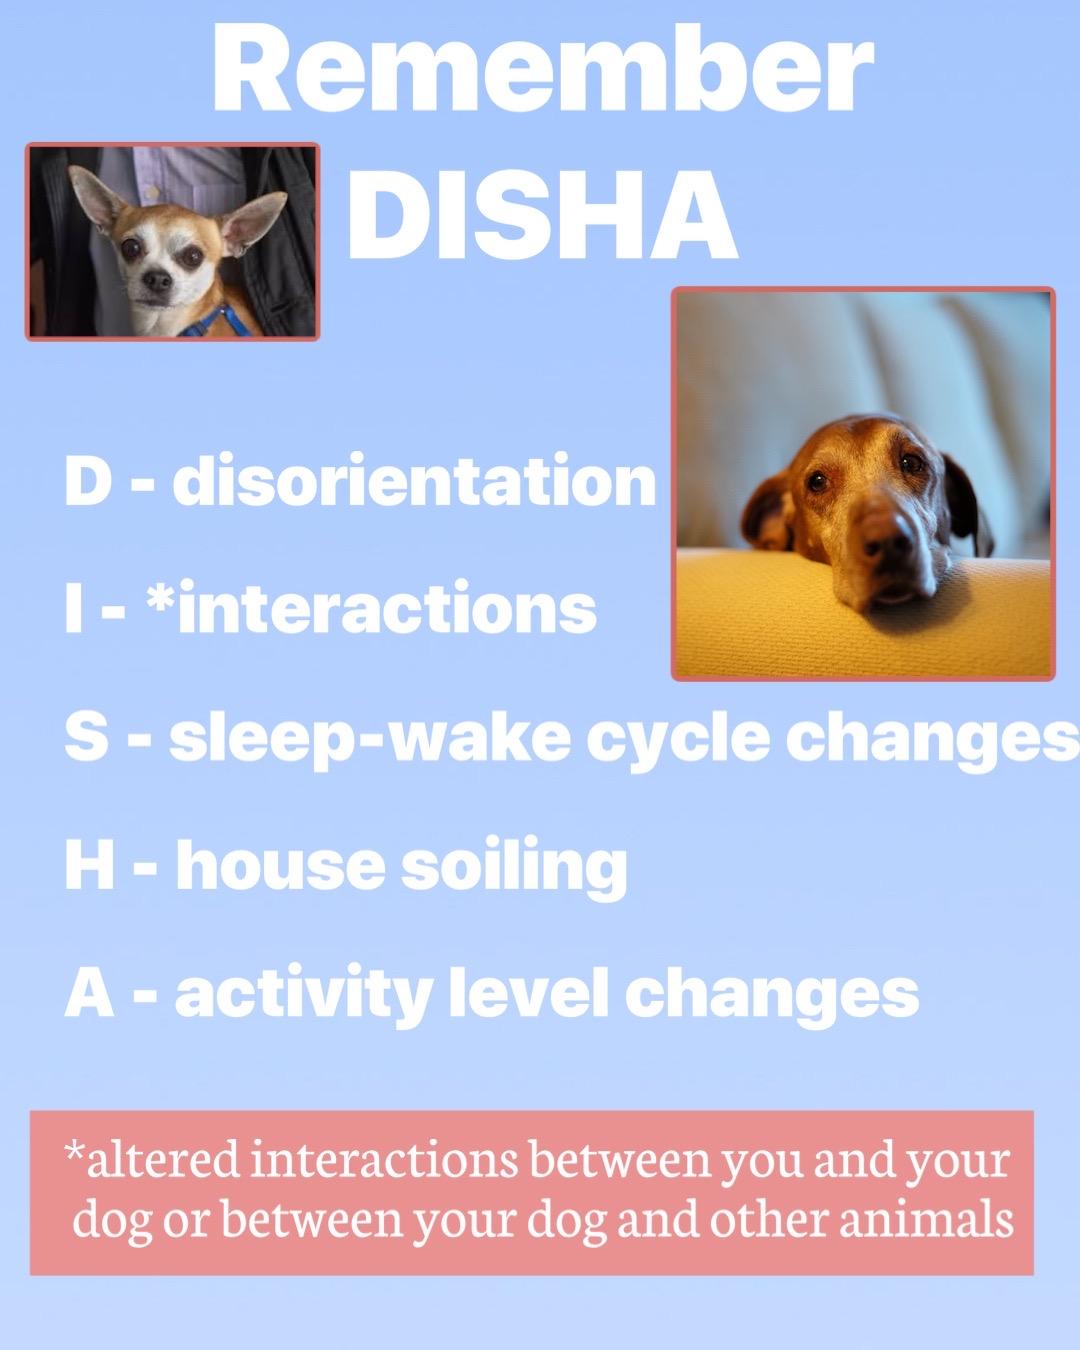 DISHA acronym